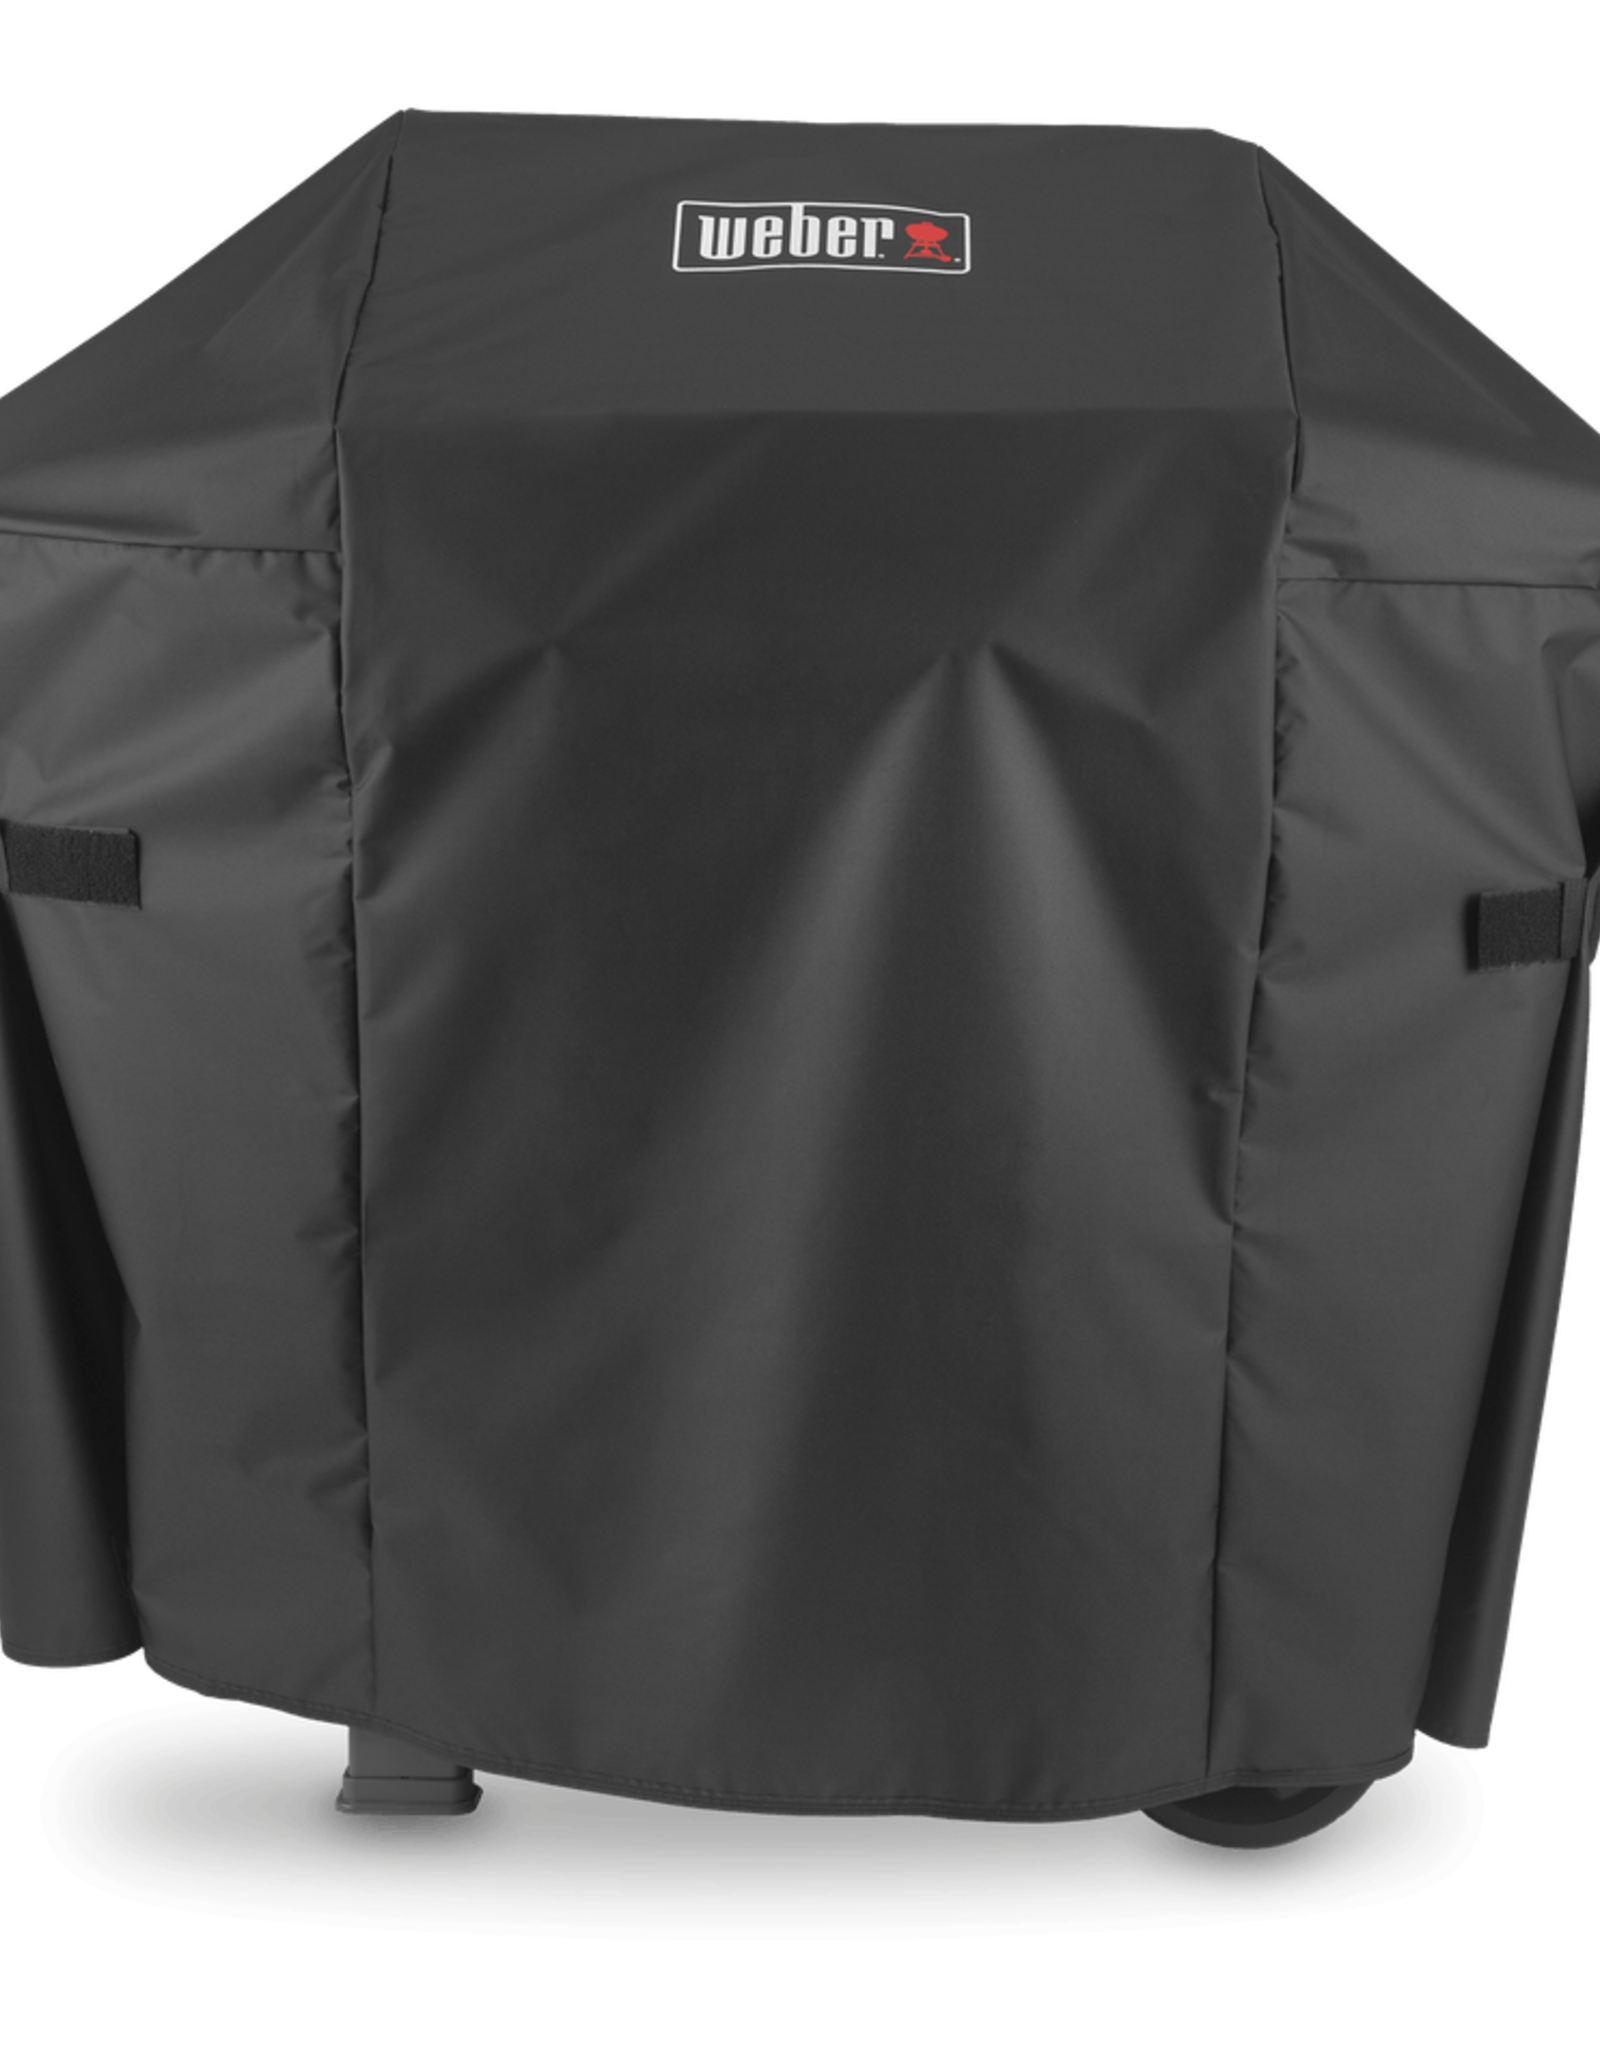 Weber Premium Grill Cover - Fits Spirit & Spirit II 200 Series